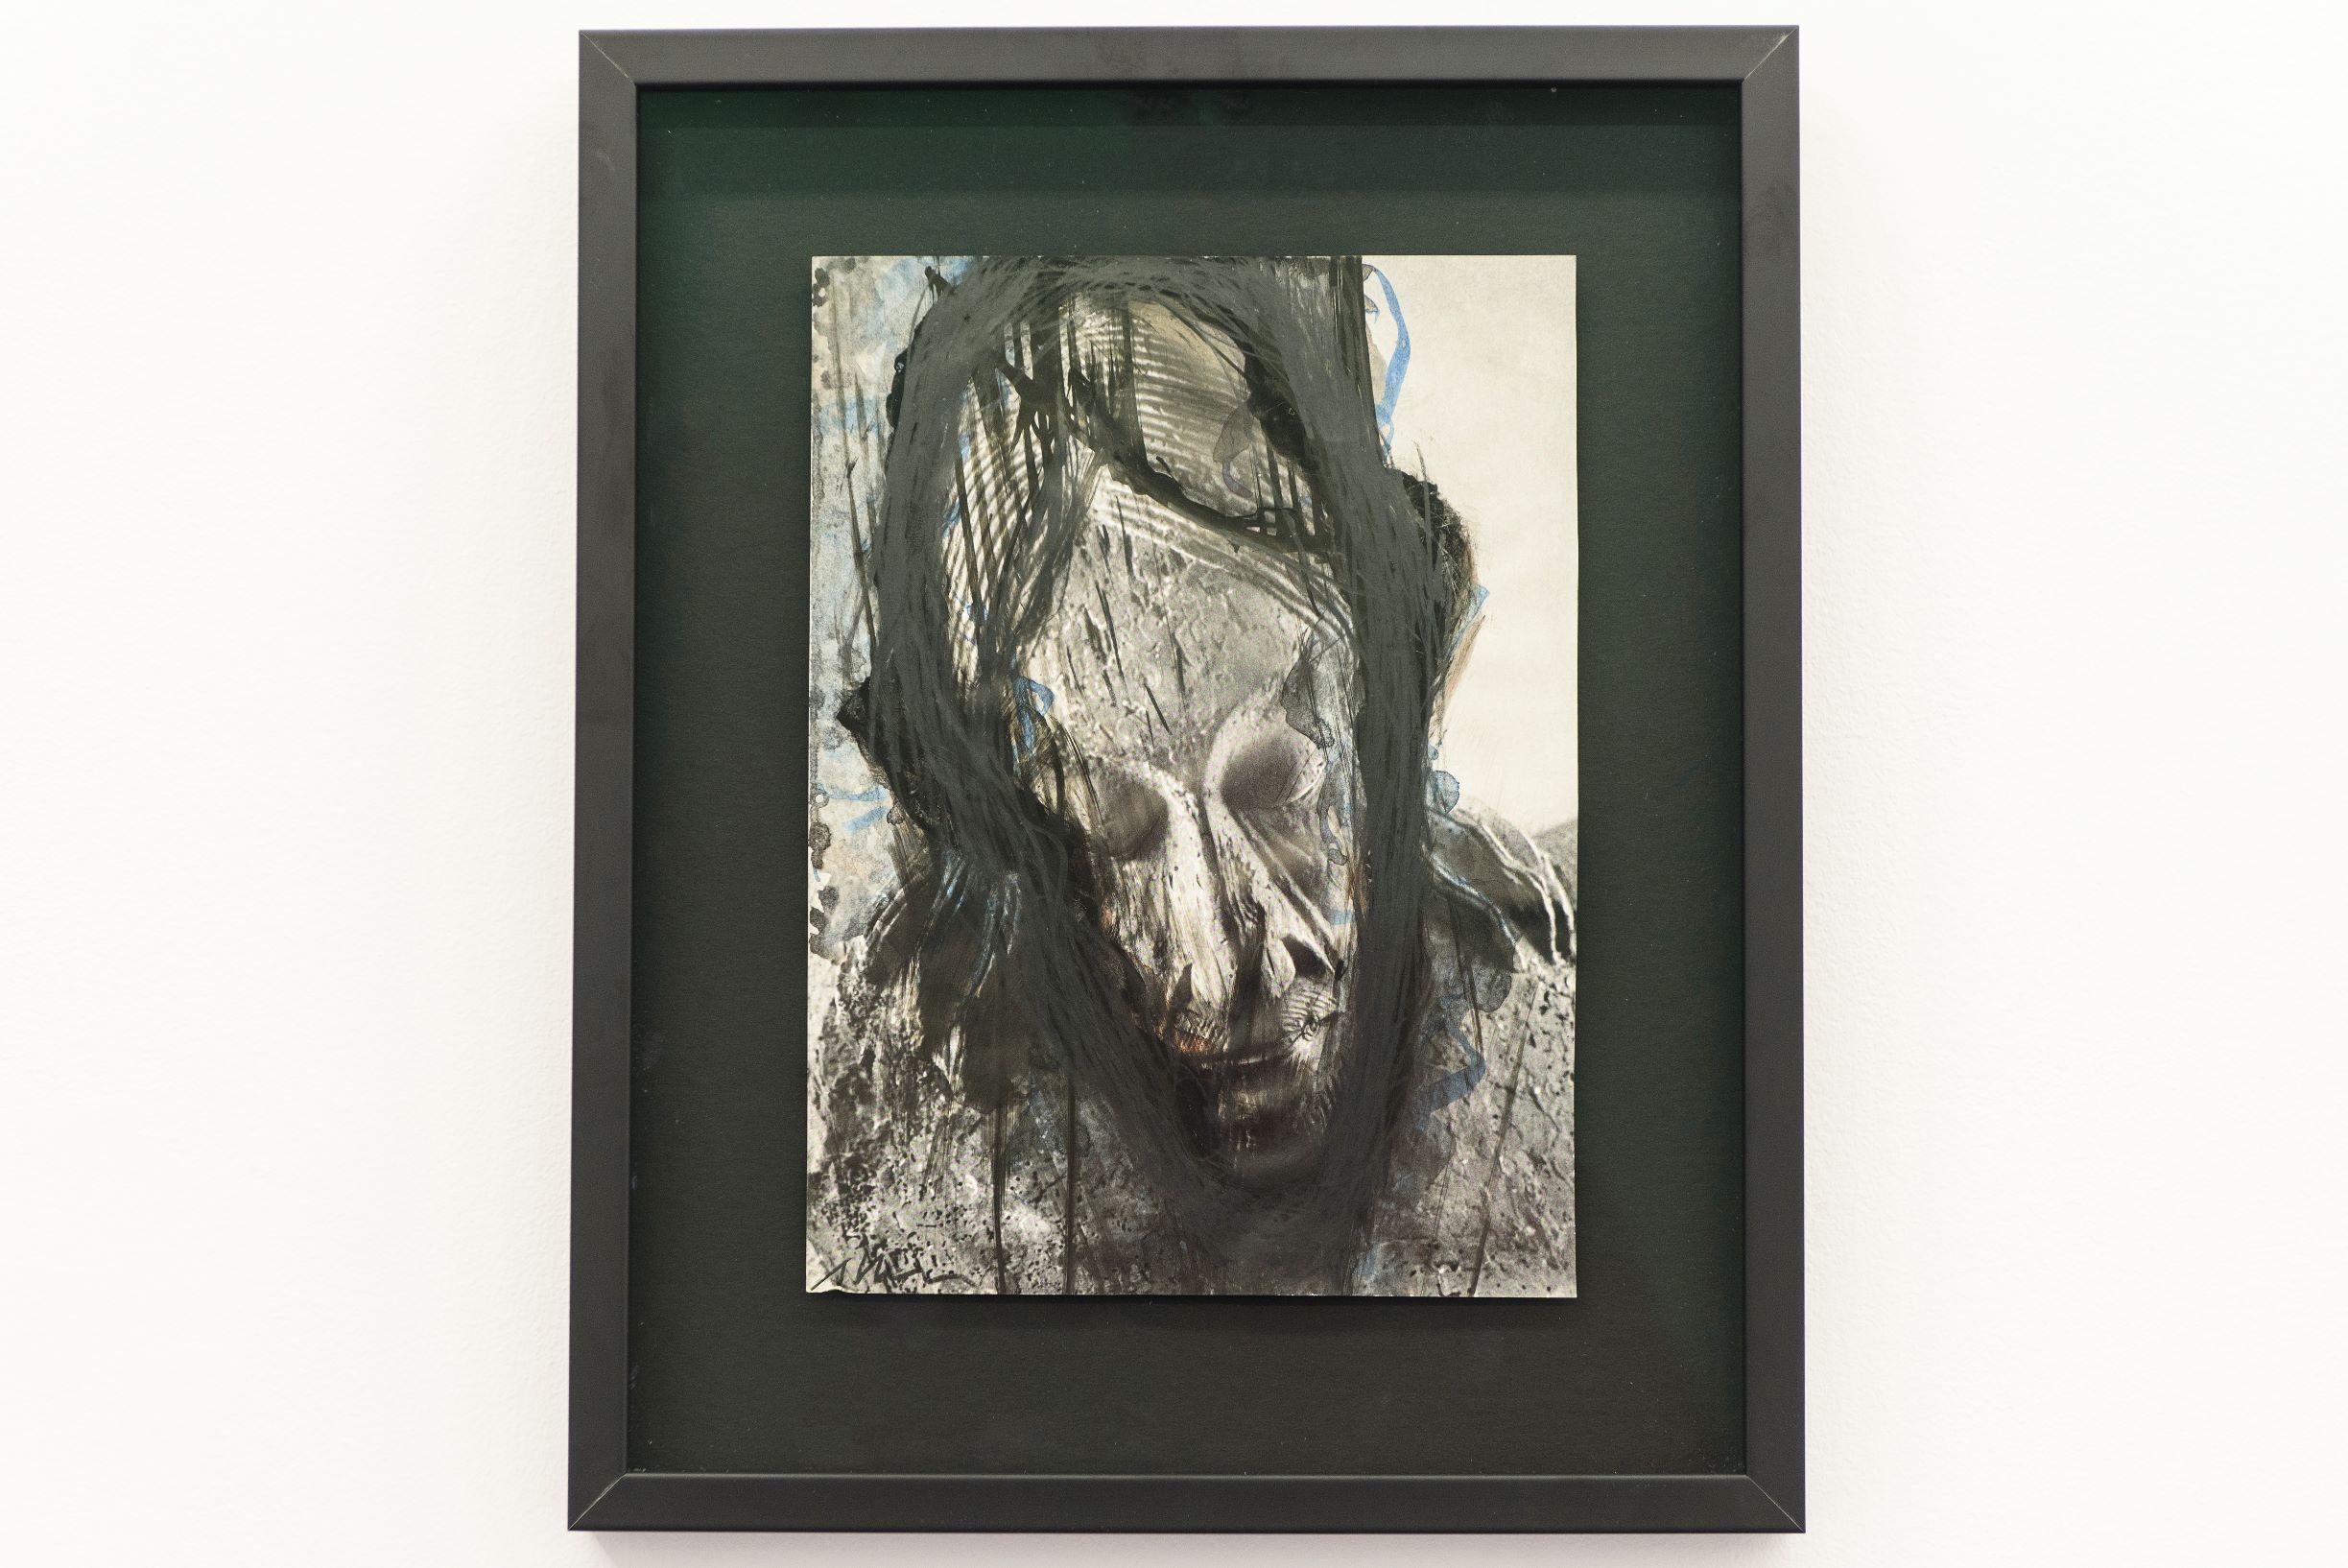 Serie Christusköpfe (1979) - Arnulf Rainer